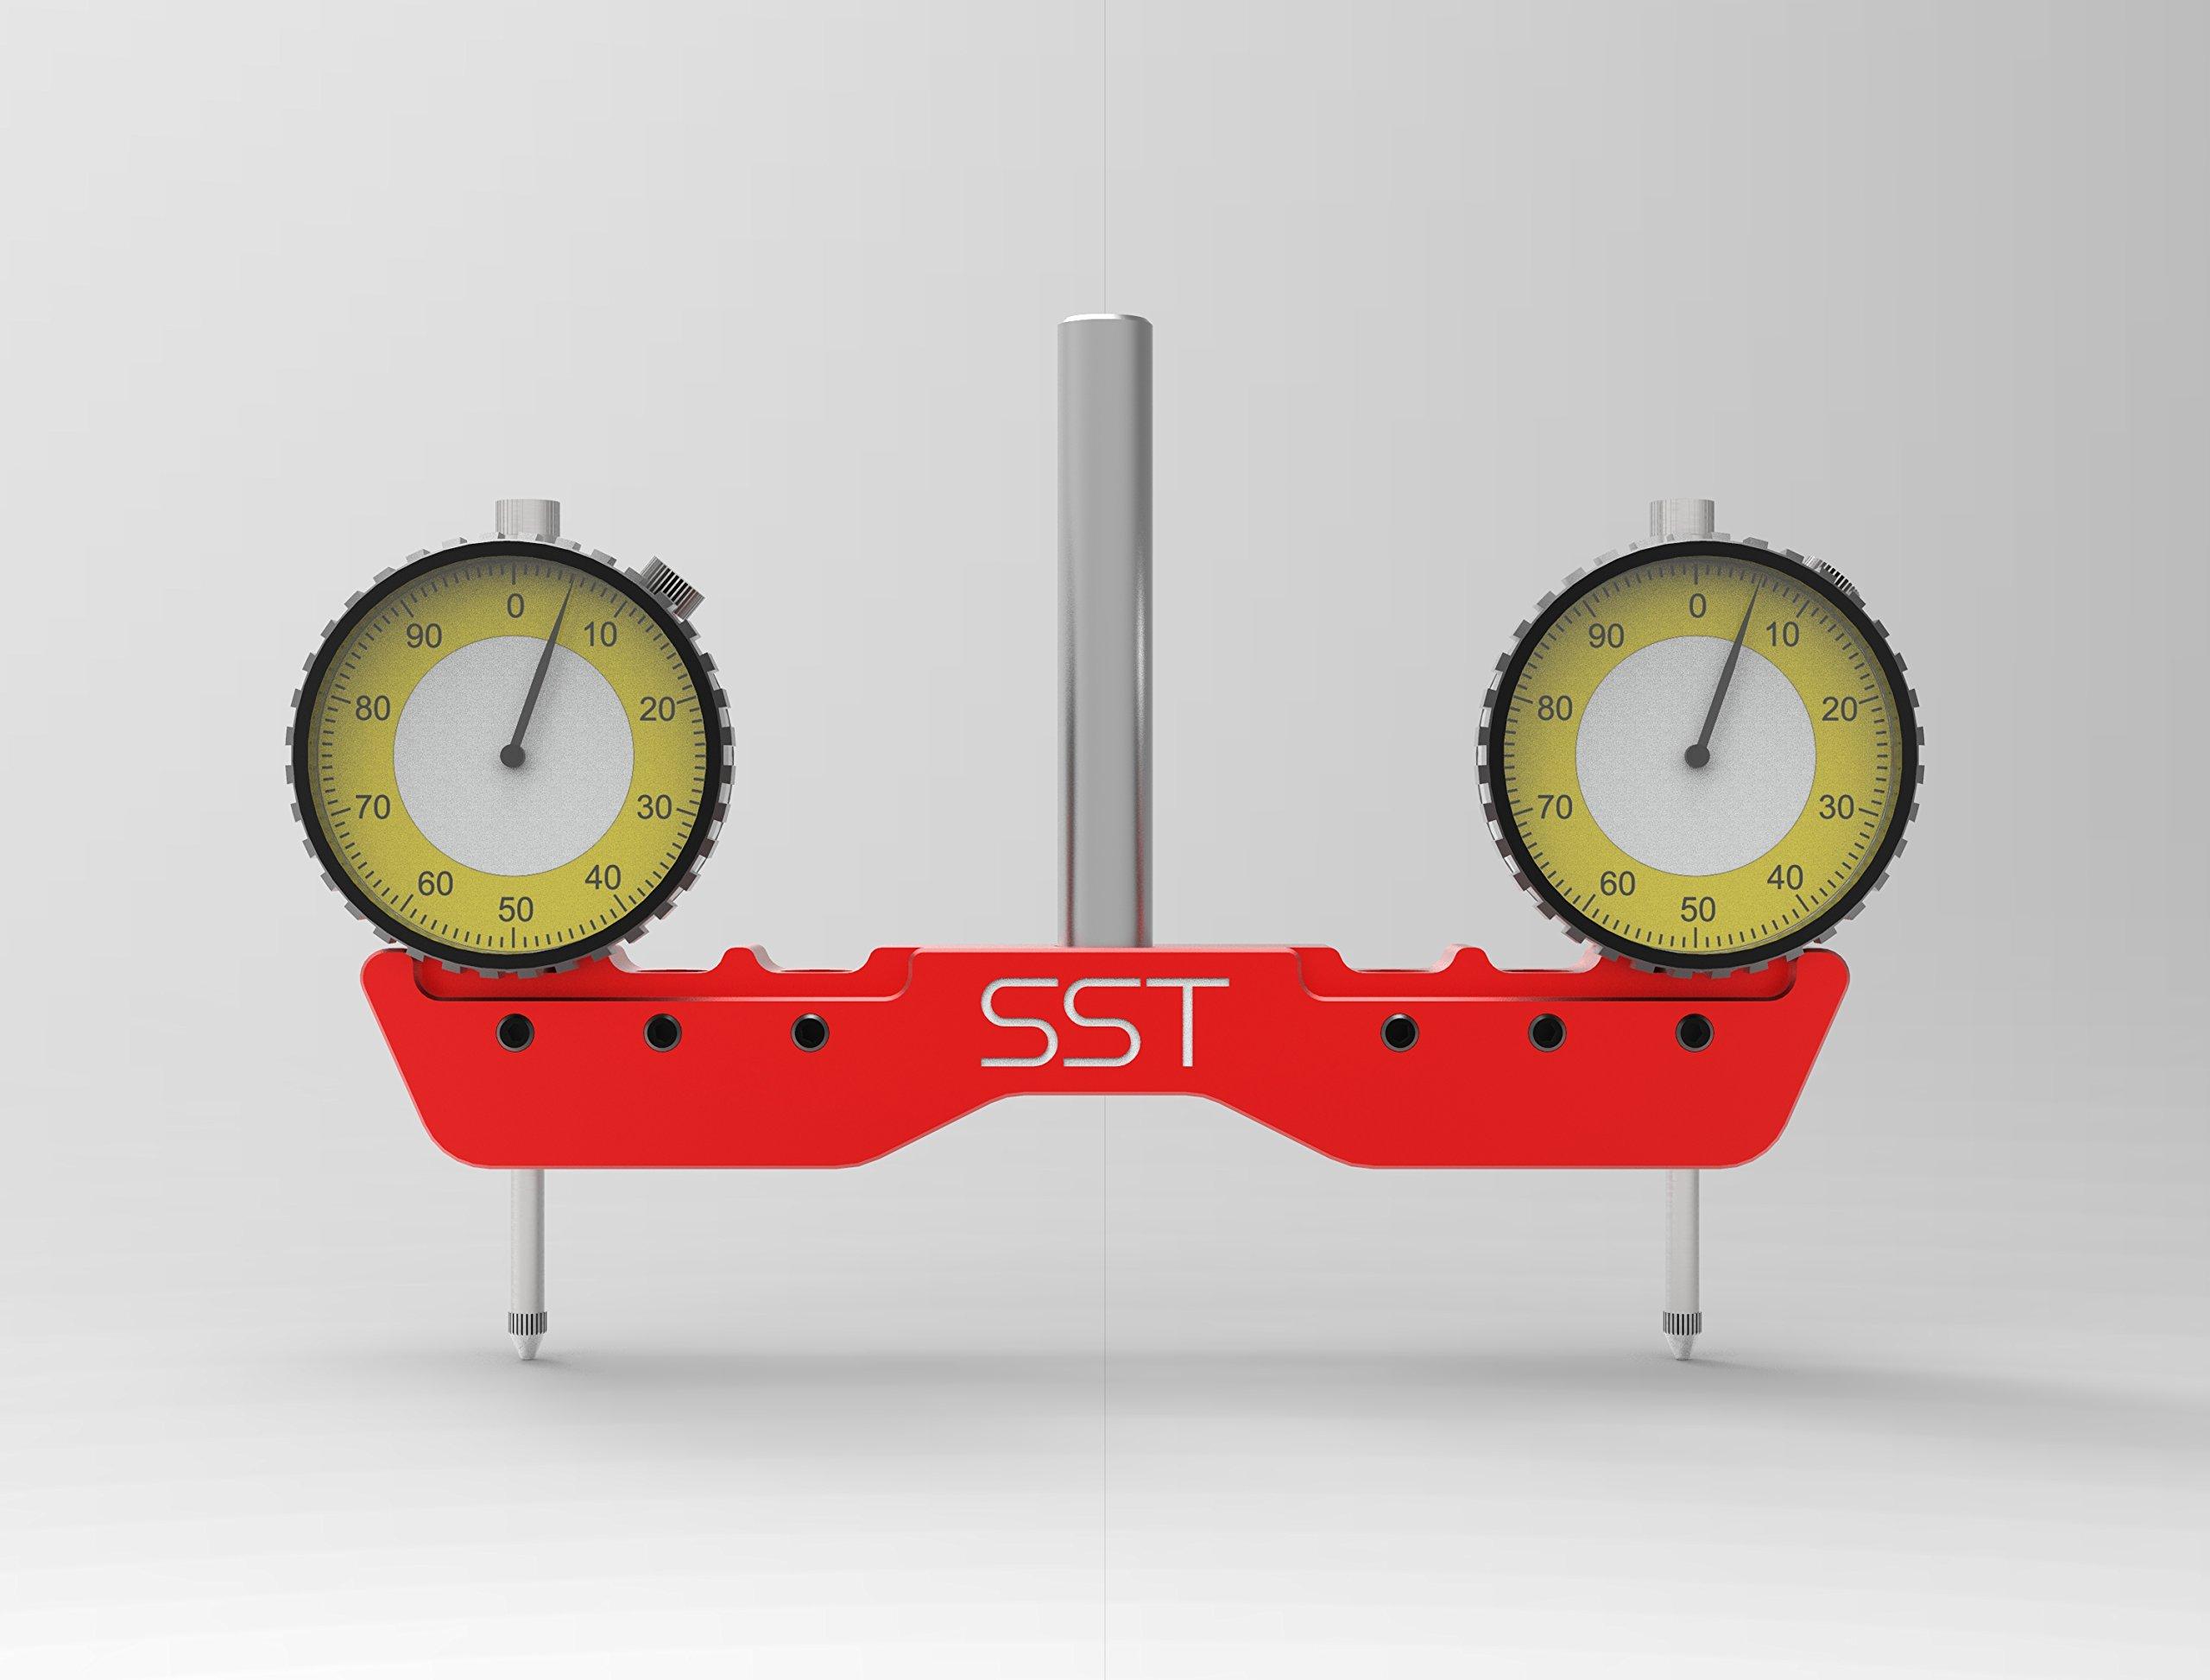 SST Mill & Lathe Adjustable Tramming - Squaring System